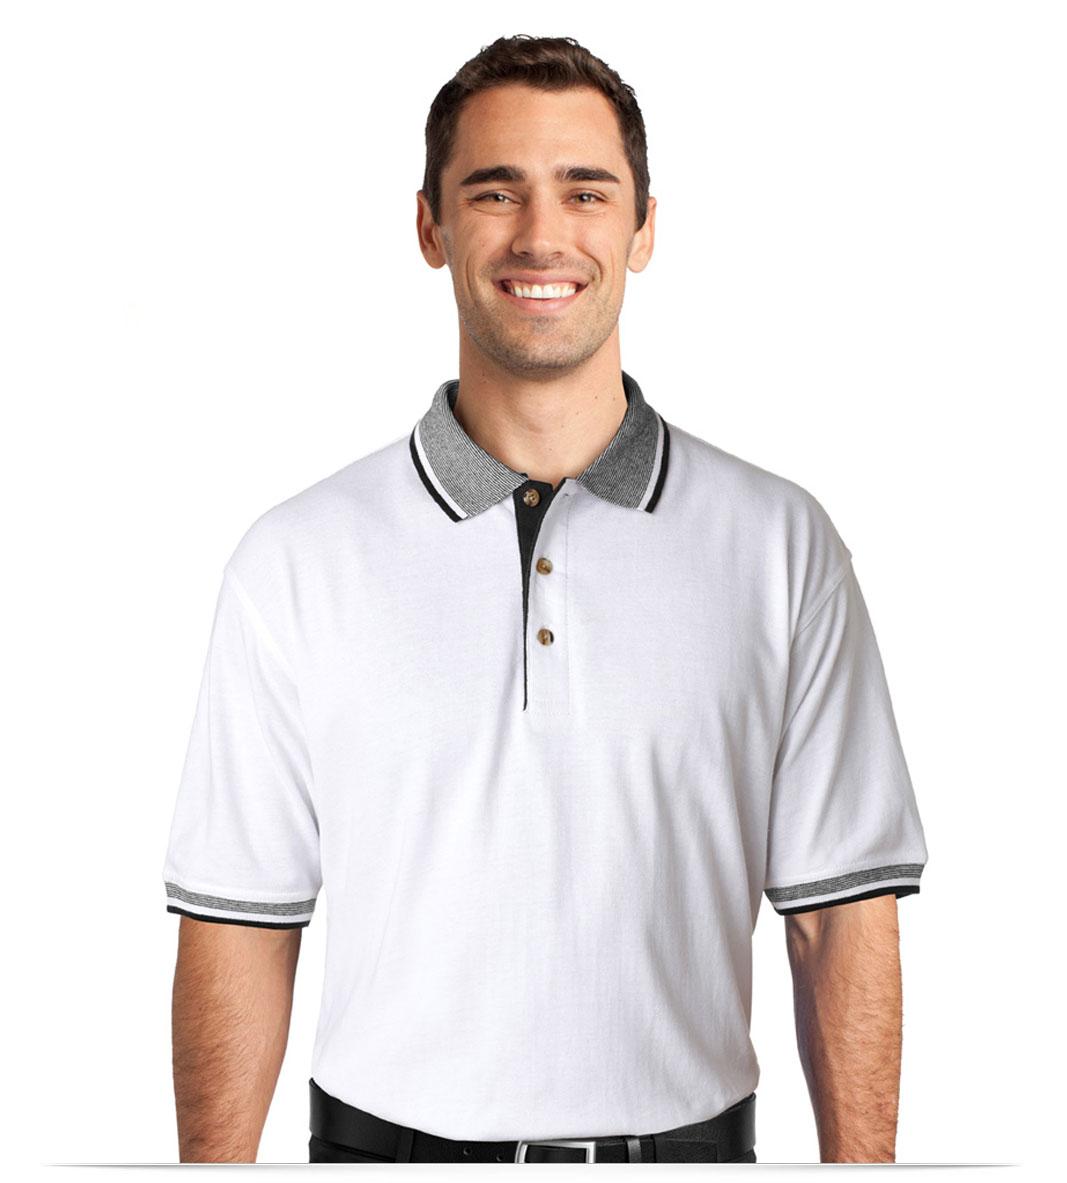 Customize 3 Tone Custom Golf Shirt